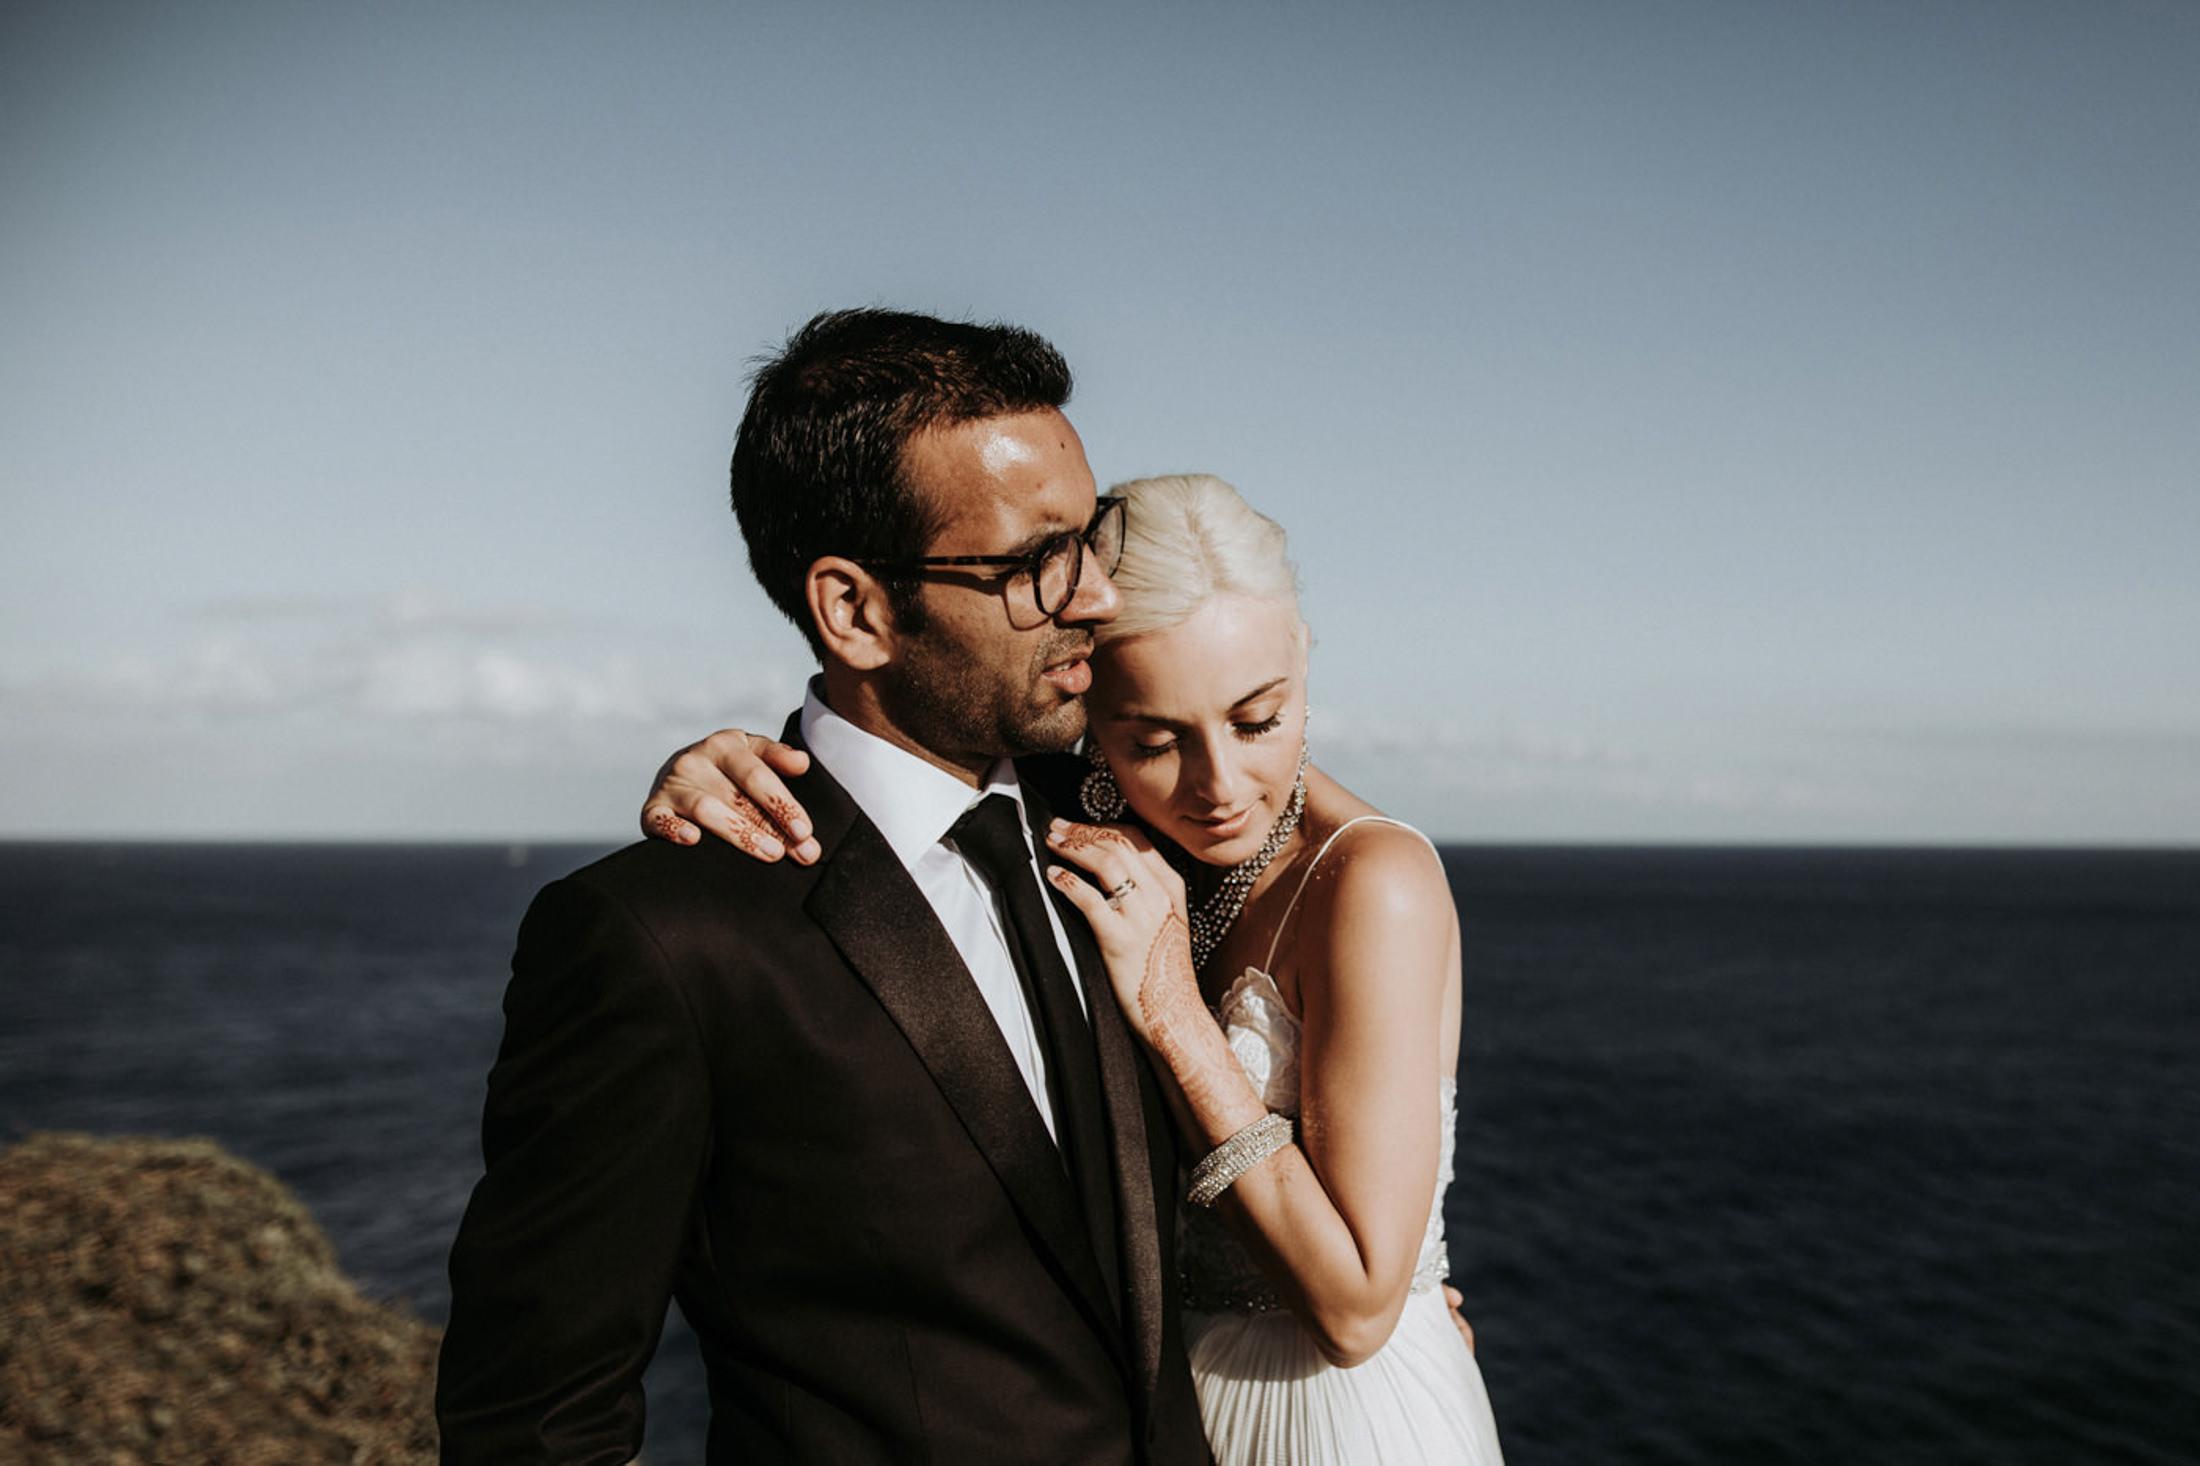 Wedding_Photographer_Mallorca_Daniela-Marquardt_Photography_New_York_Iceland_Tuscany_Santorini_Portugal_Austria_Bavaria_Elopement_Hochzeitsfotograf_AntjeRajat2_82